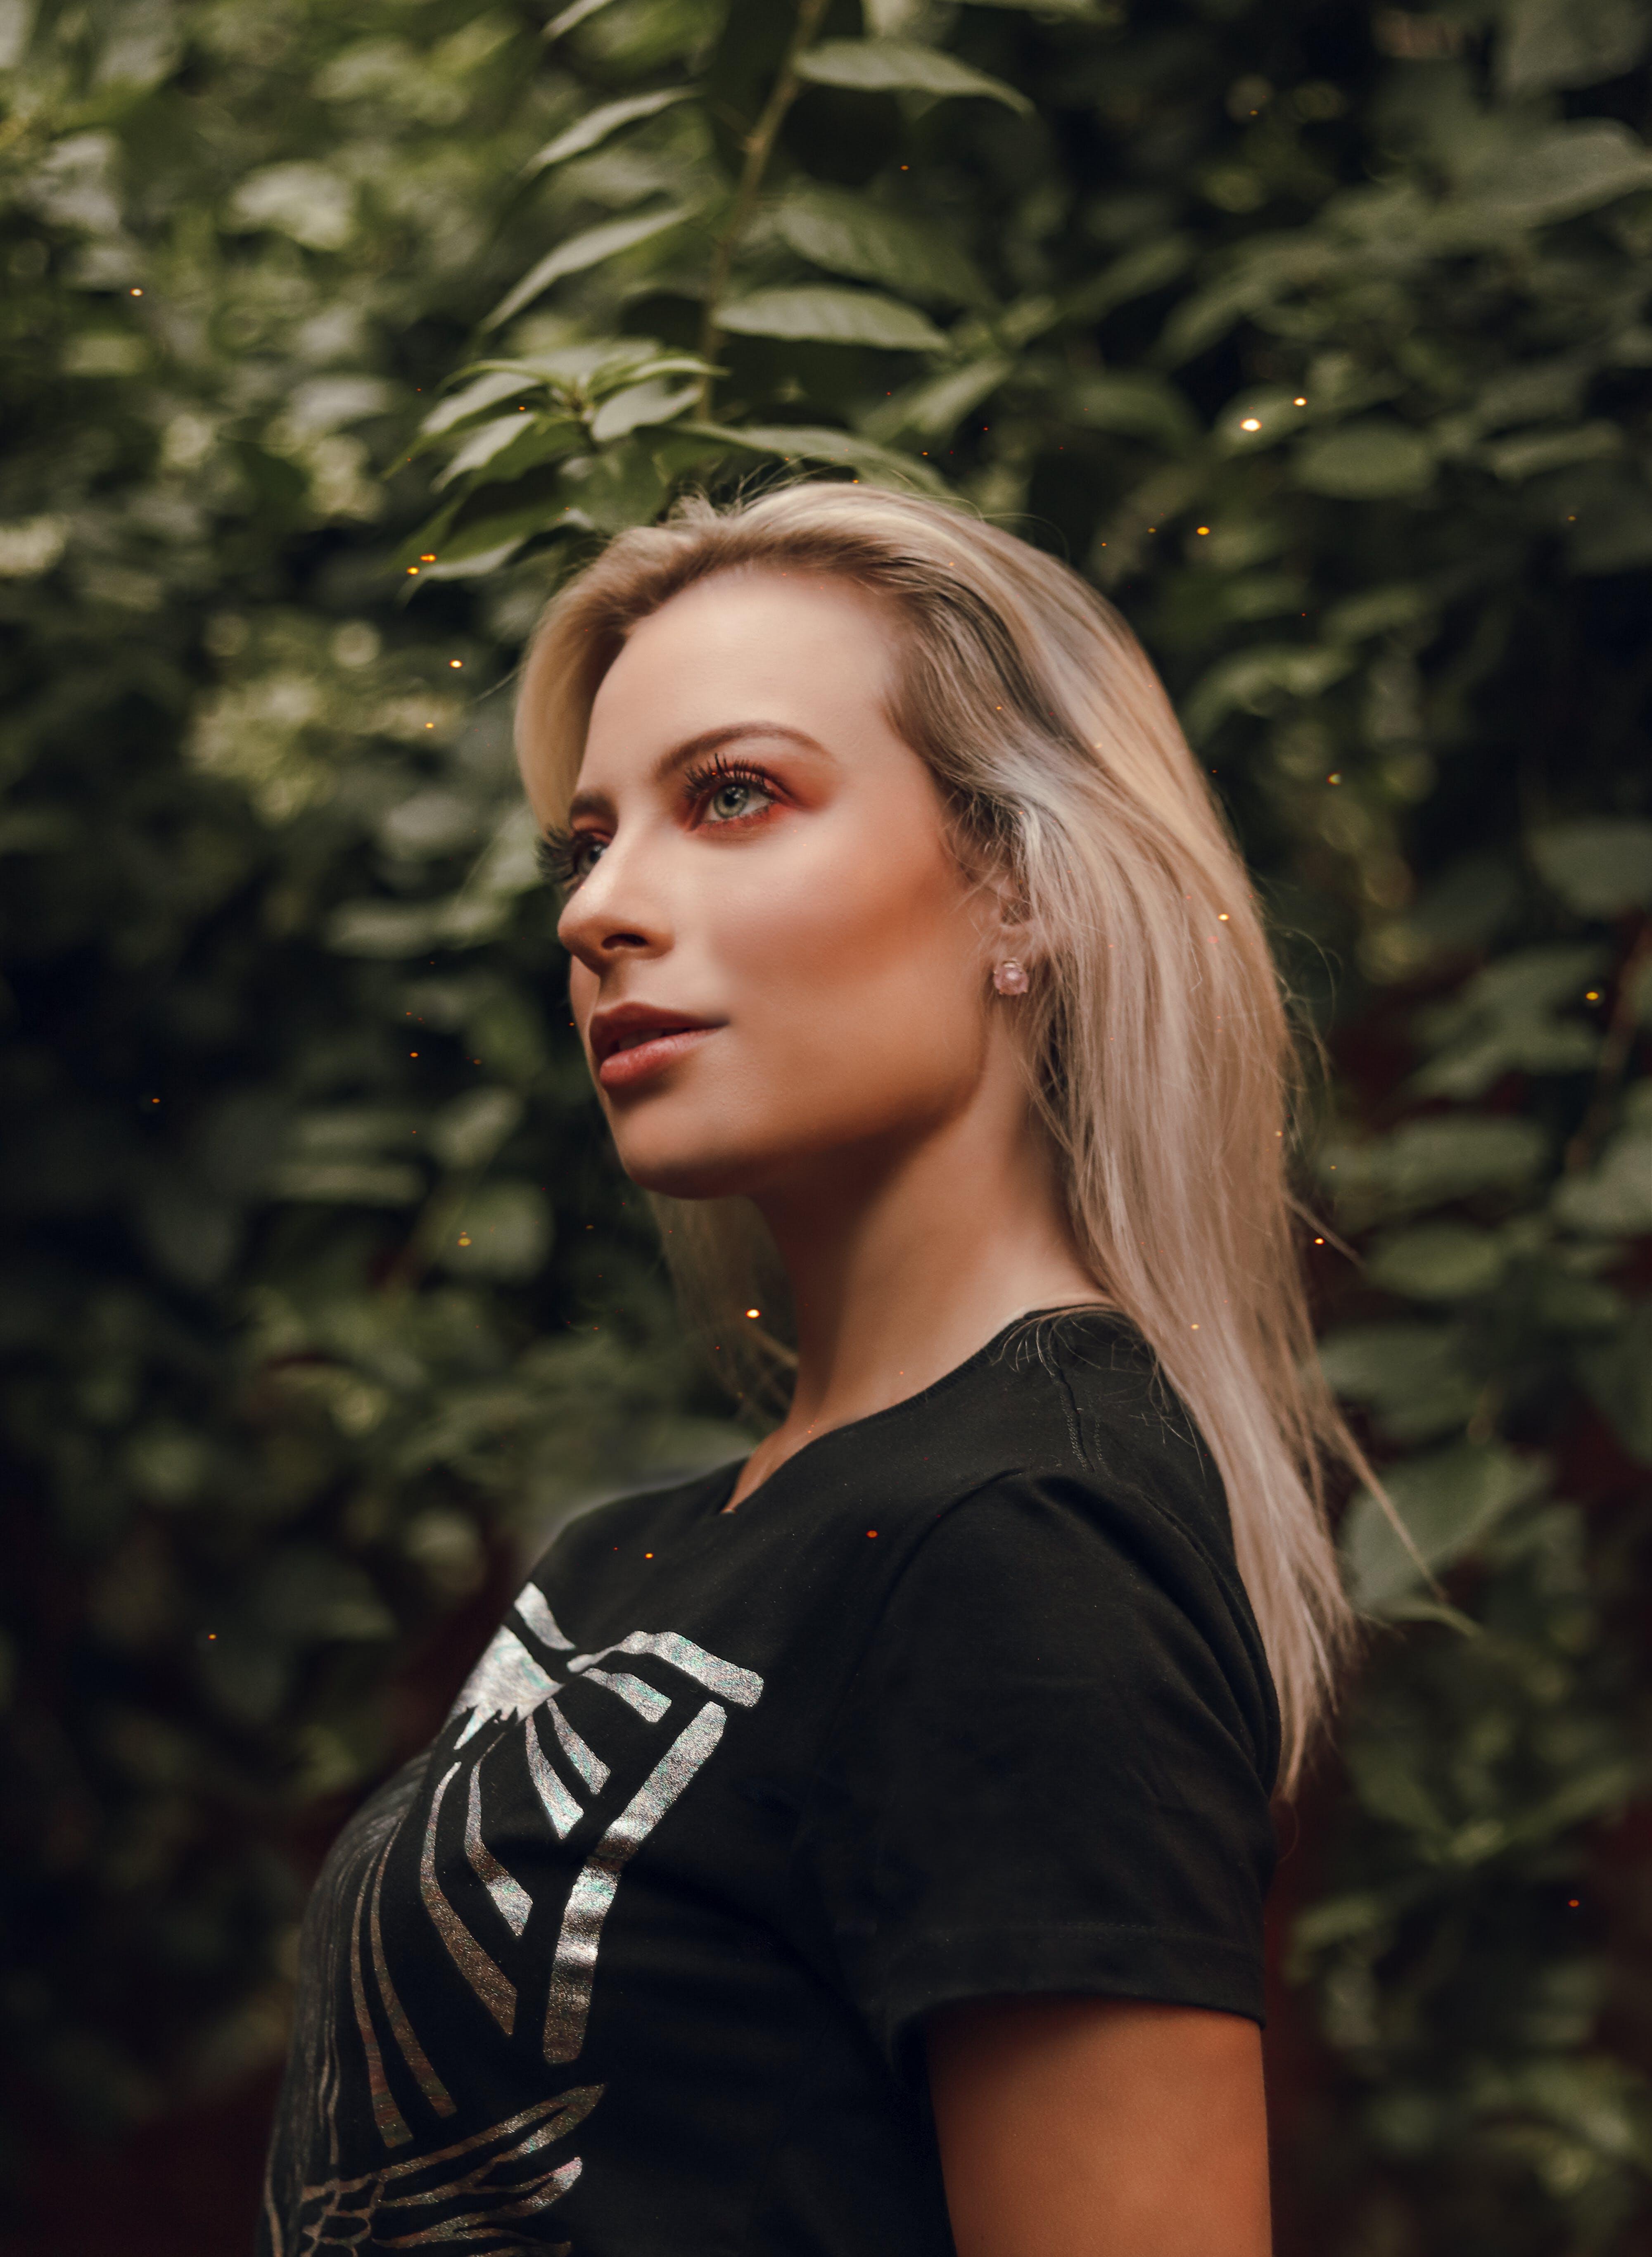 Woman in Black Crew-neck T-shirt Standing Near Green Tree